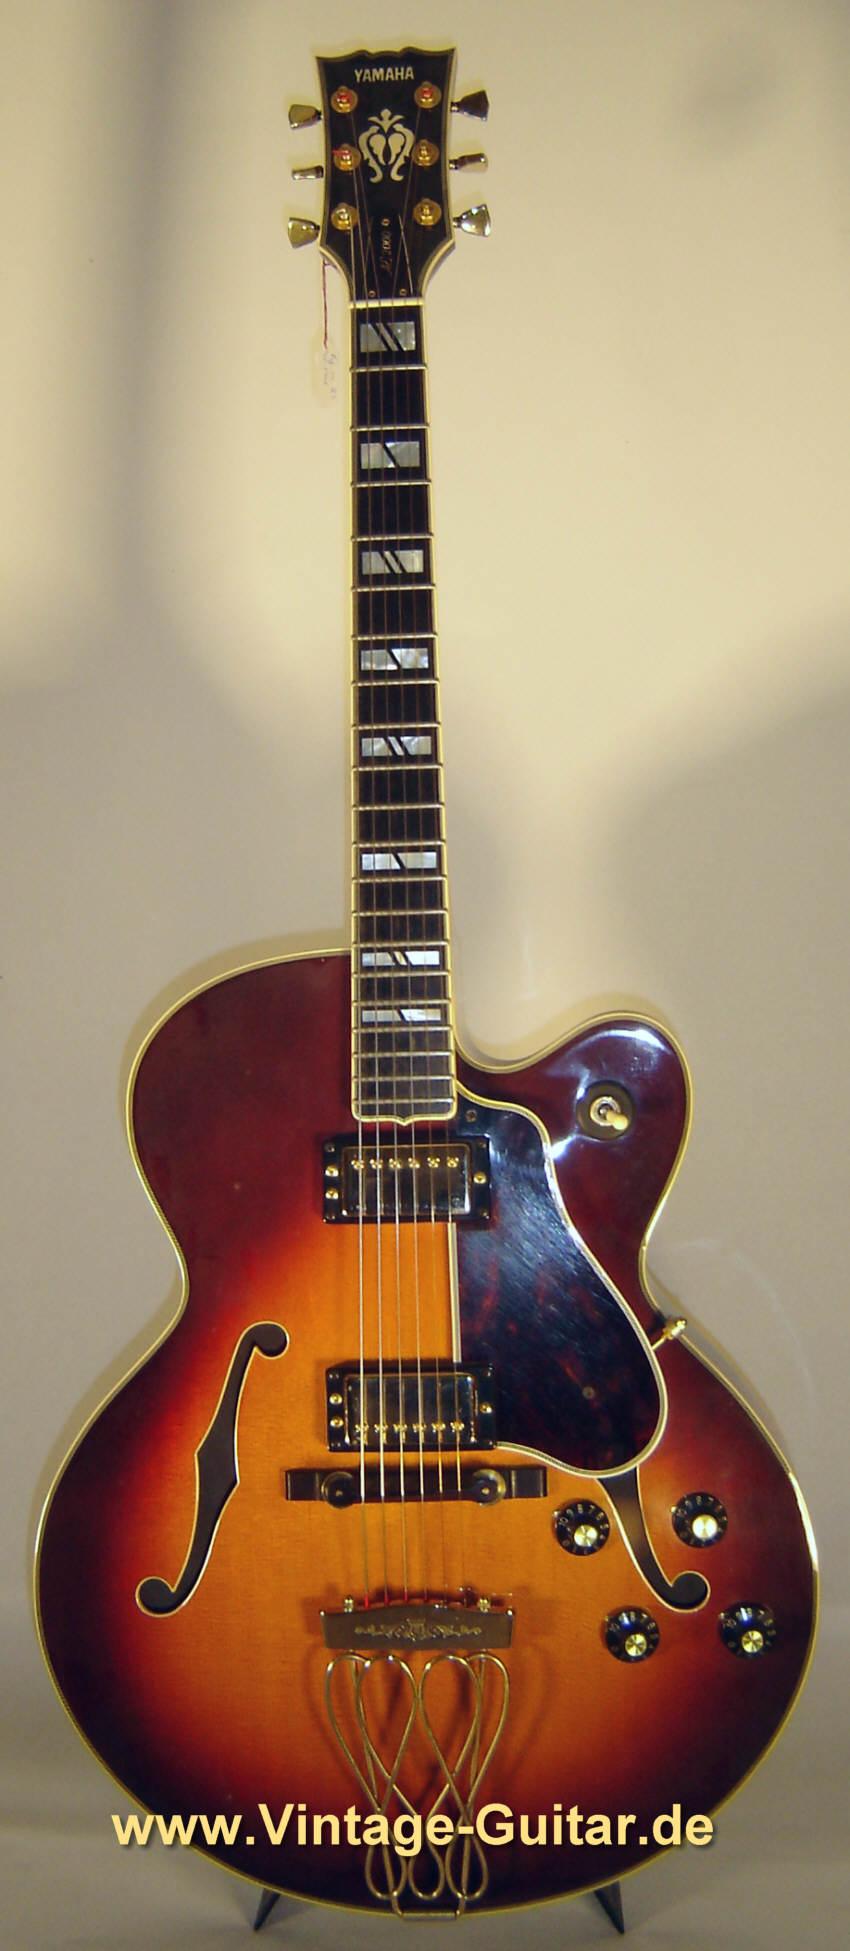 Yamaha Guitar Archives